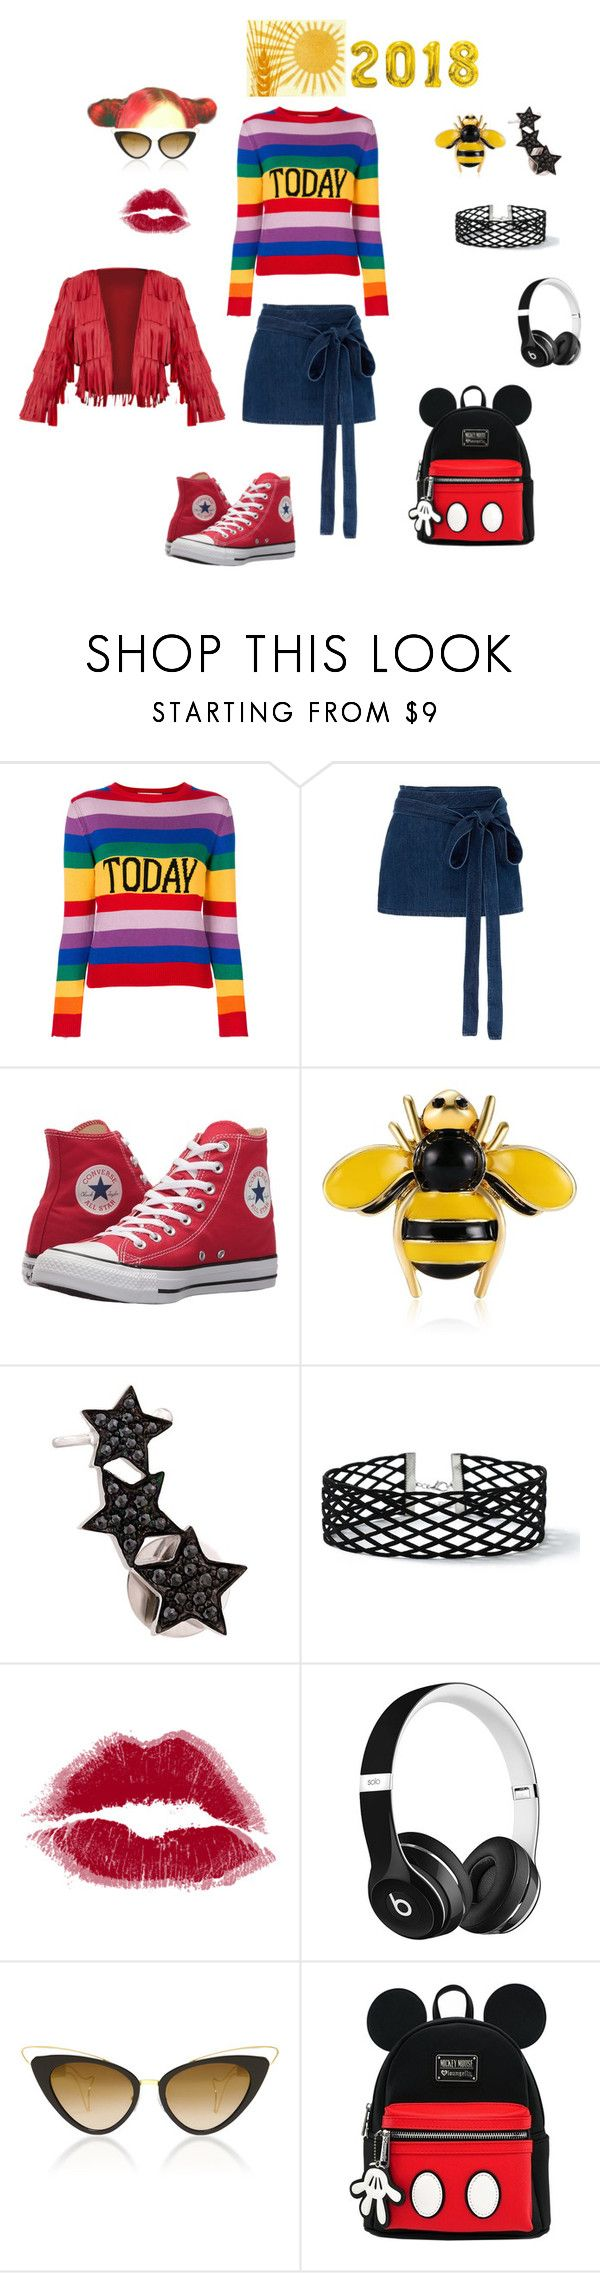 """today"" by yeniinciayla on Polyvore featuring moda, Alberta Ferretti, J.W. Anderson, Converse, Alinka, Miss Selfridge ve Beats by Dr. Dre"